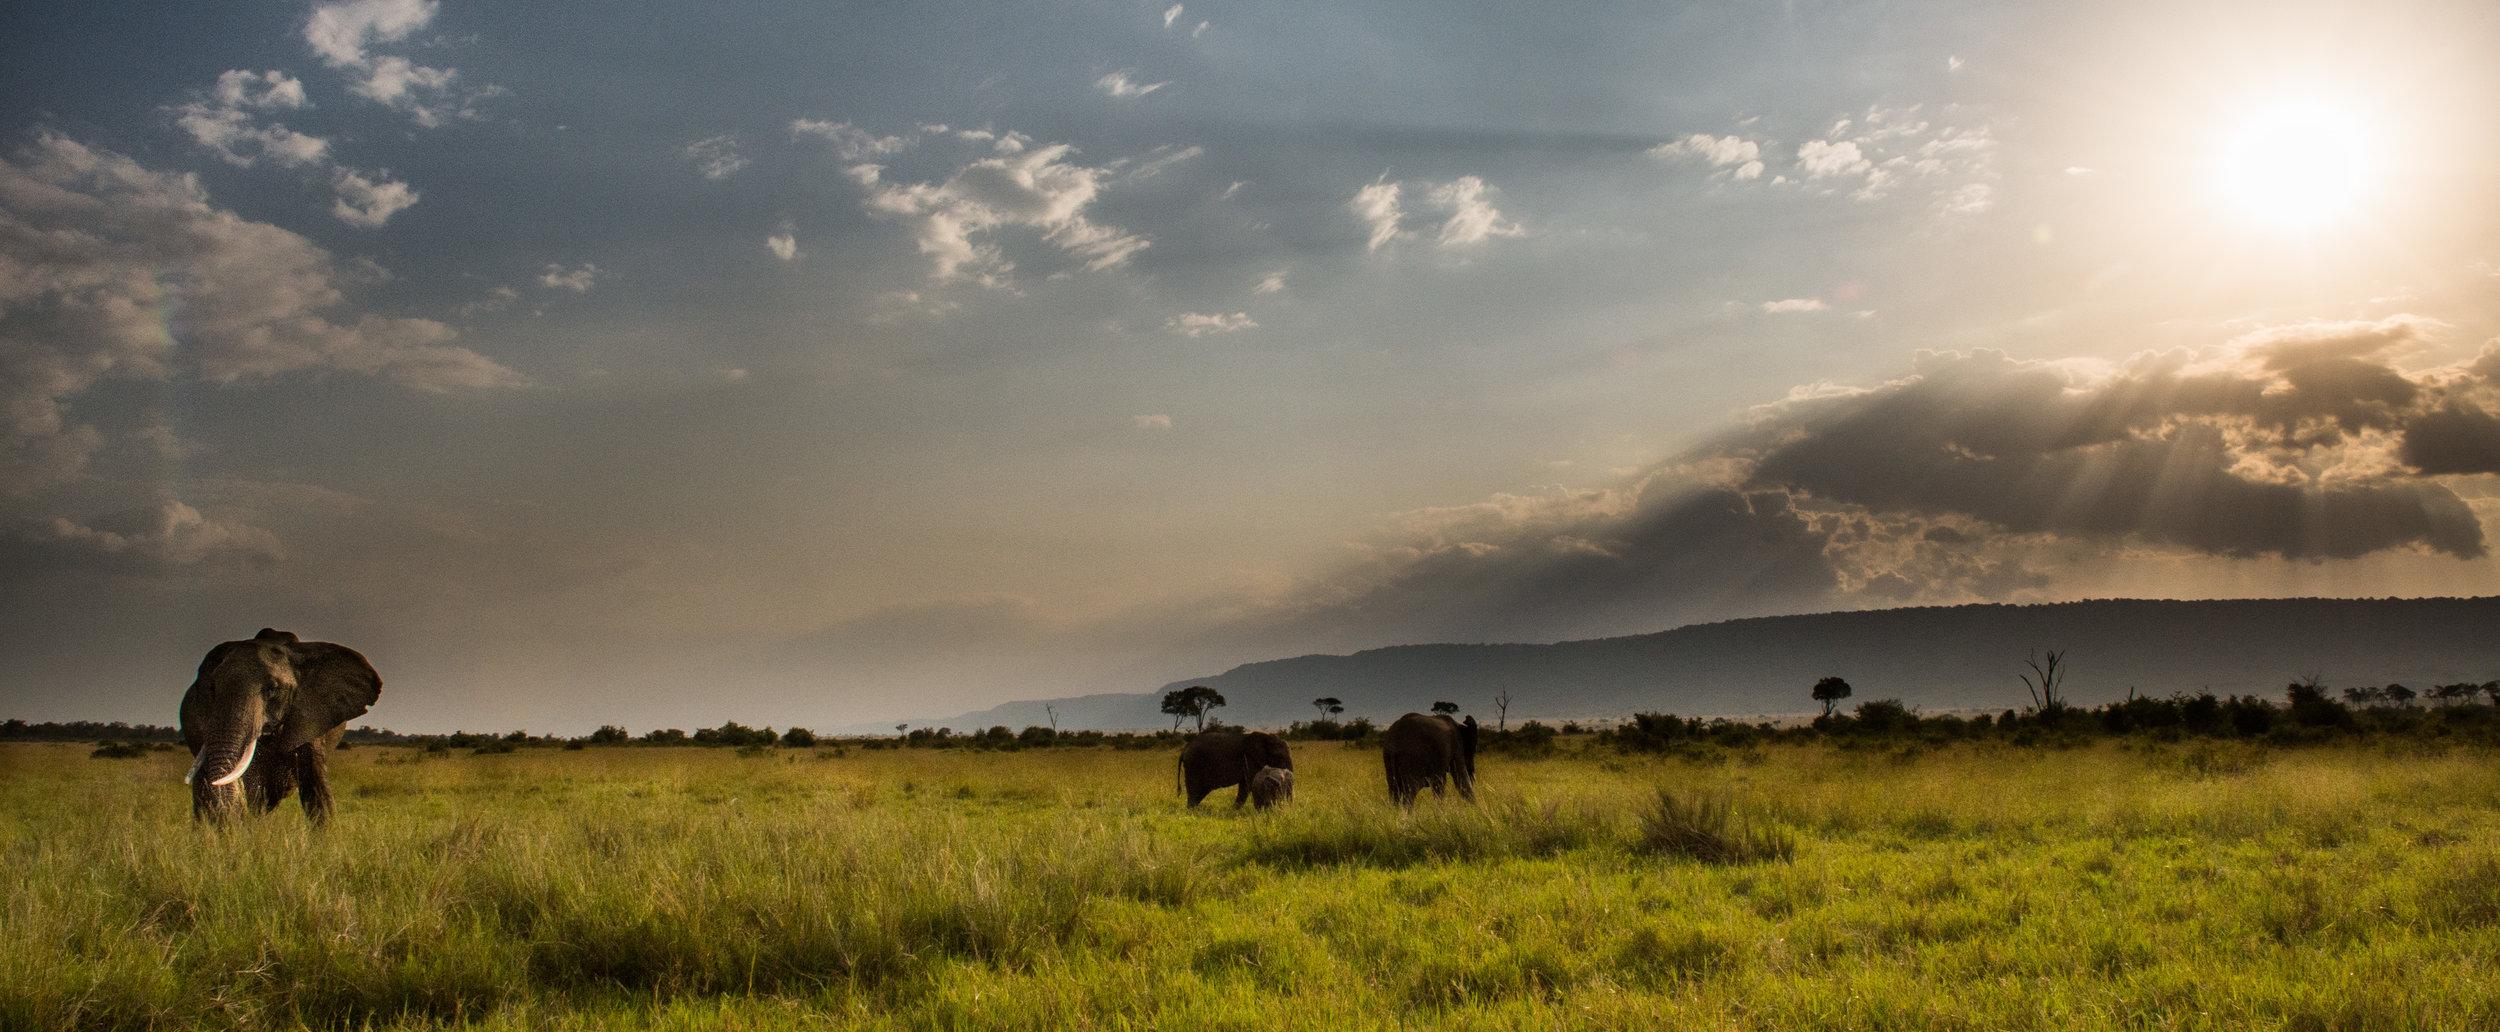 Elephant, Maasai Mara National Reserve, Kenya. Photo:   © Jon McCormack | Conservation International